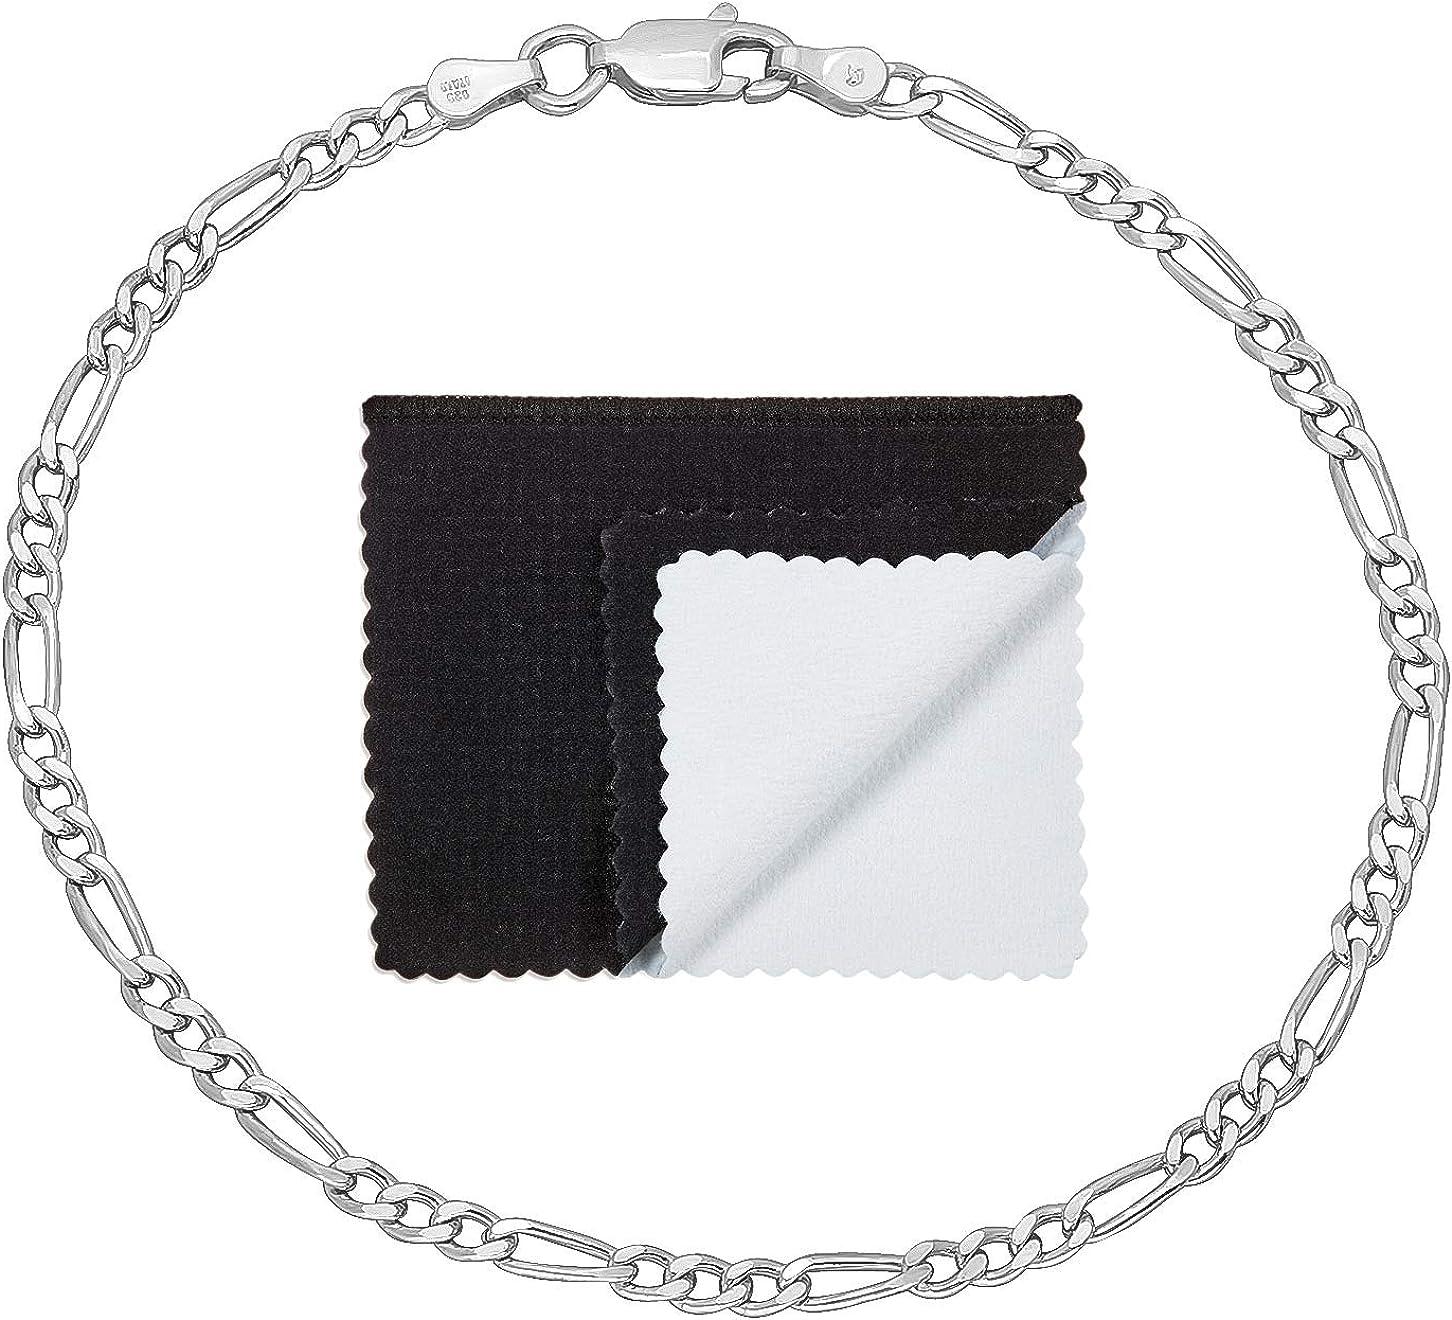 3mm Solid Japan Maker New .925 Sterling Silver Figaro Link Chain safety Bracelet Flat